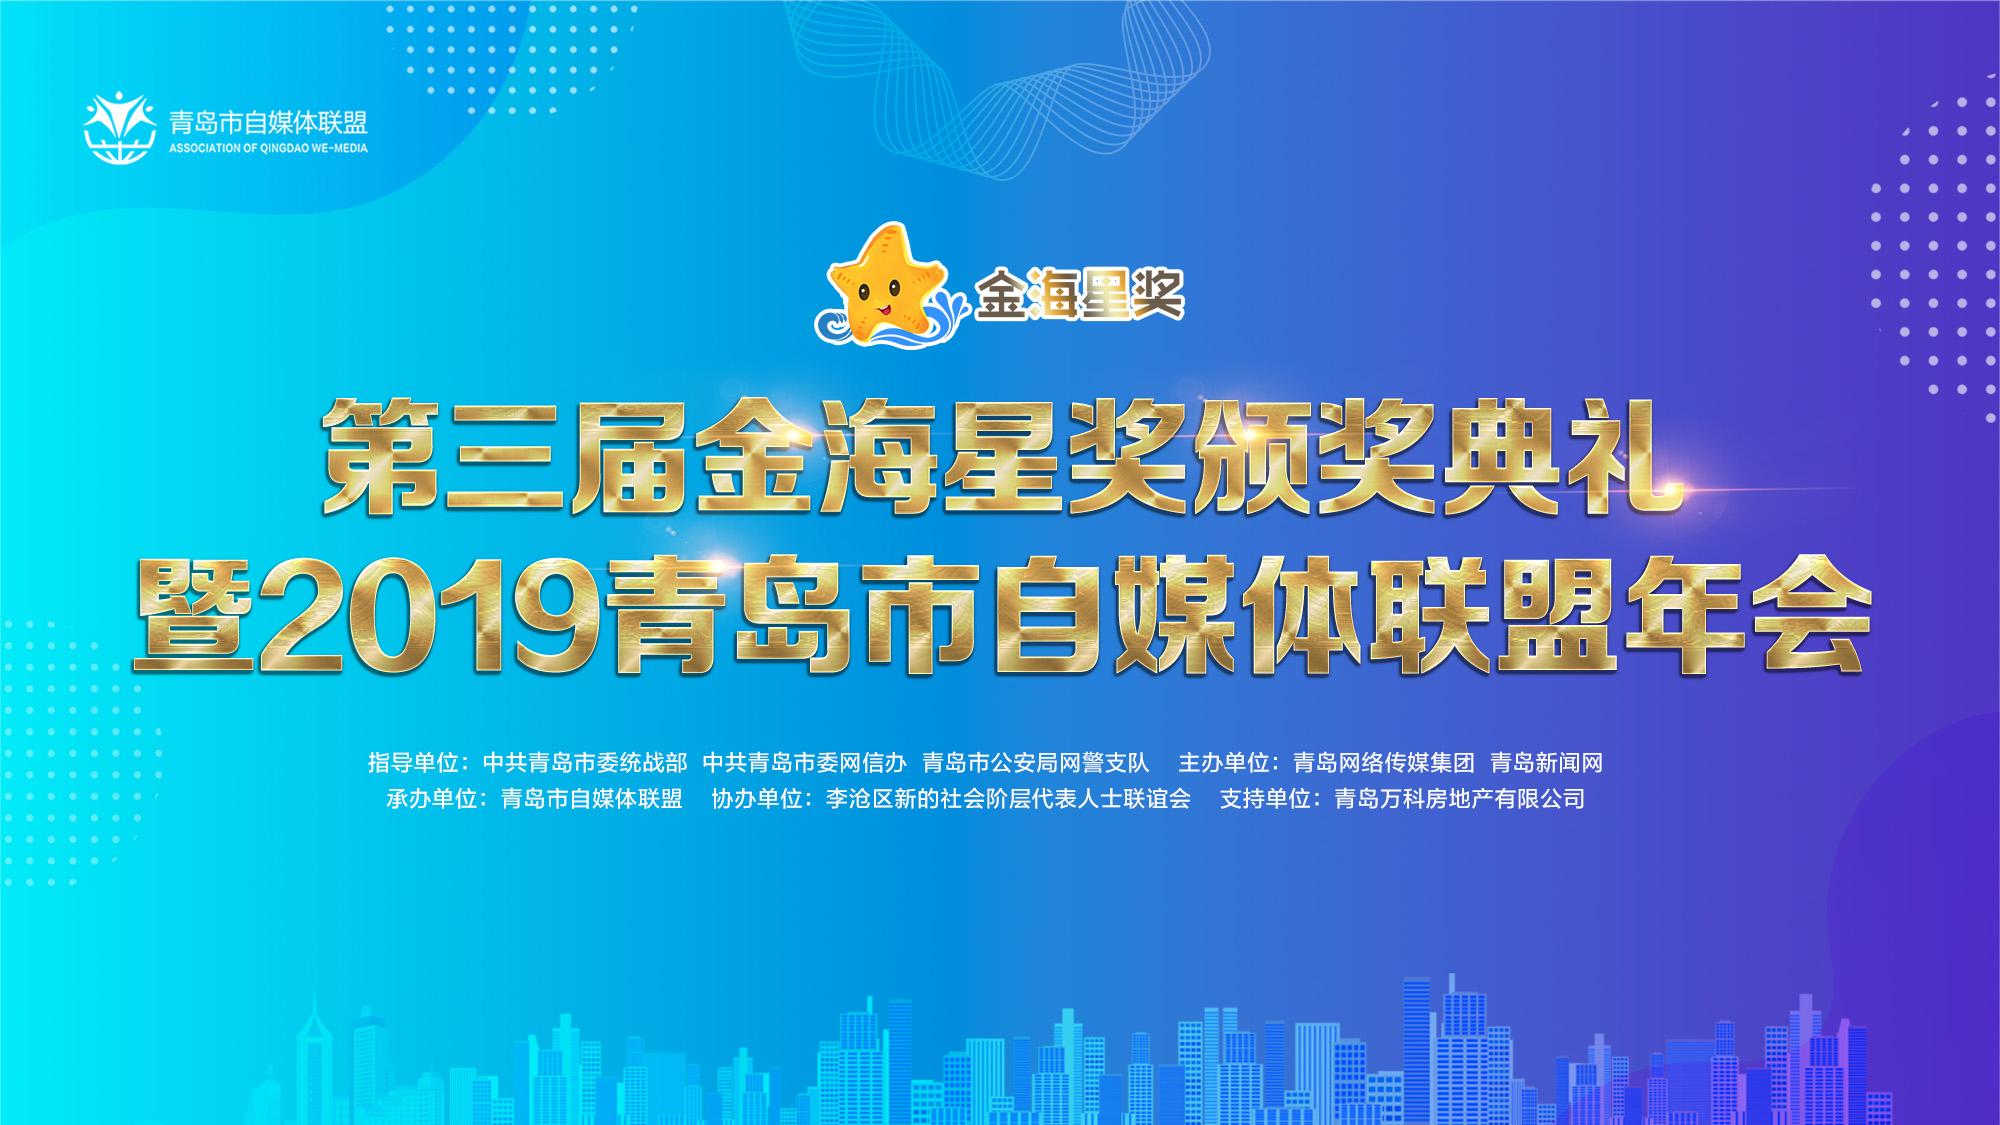 http://live.qingdaonews.com/live/public/attachs/live/202001/14/fb7bd02db143b9cee5749cf413d5d890088d0a2b1578971967.jpg